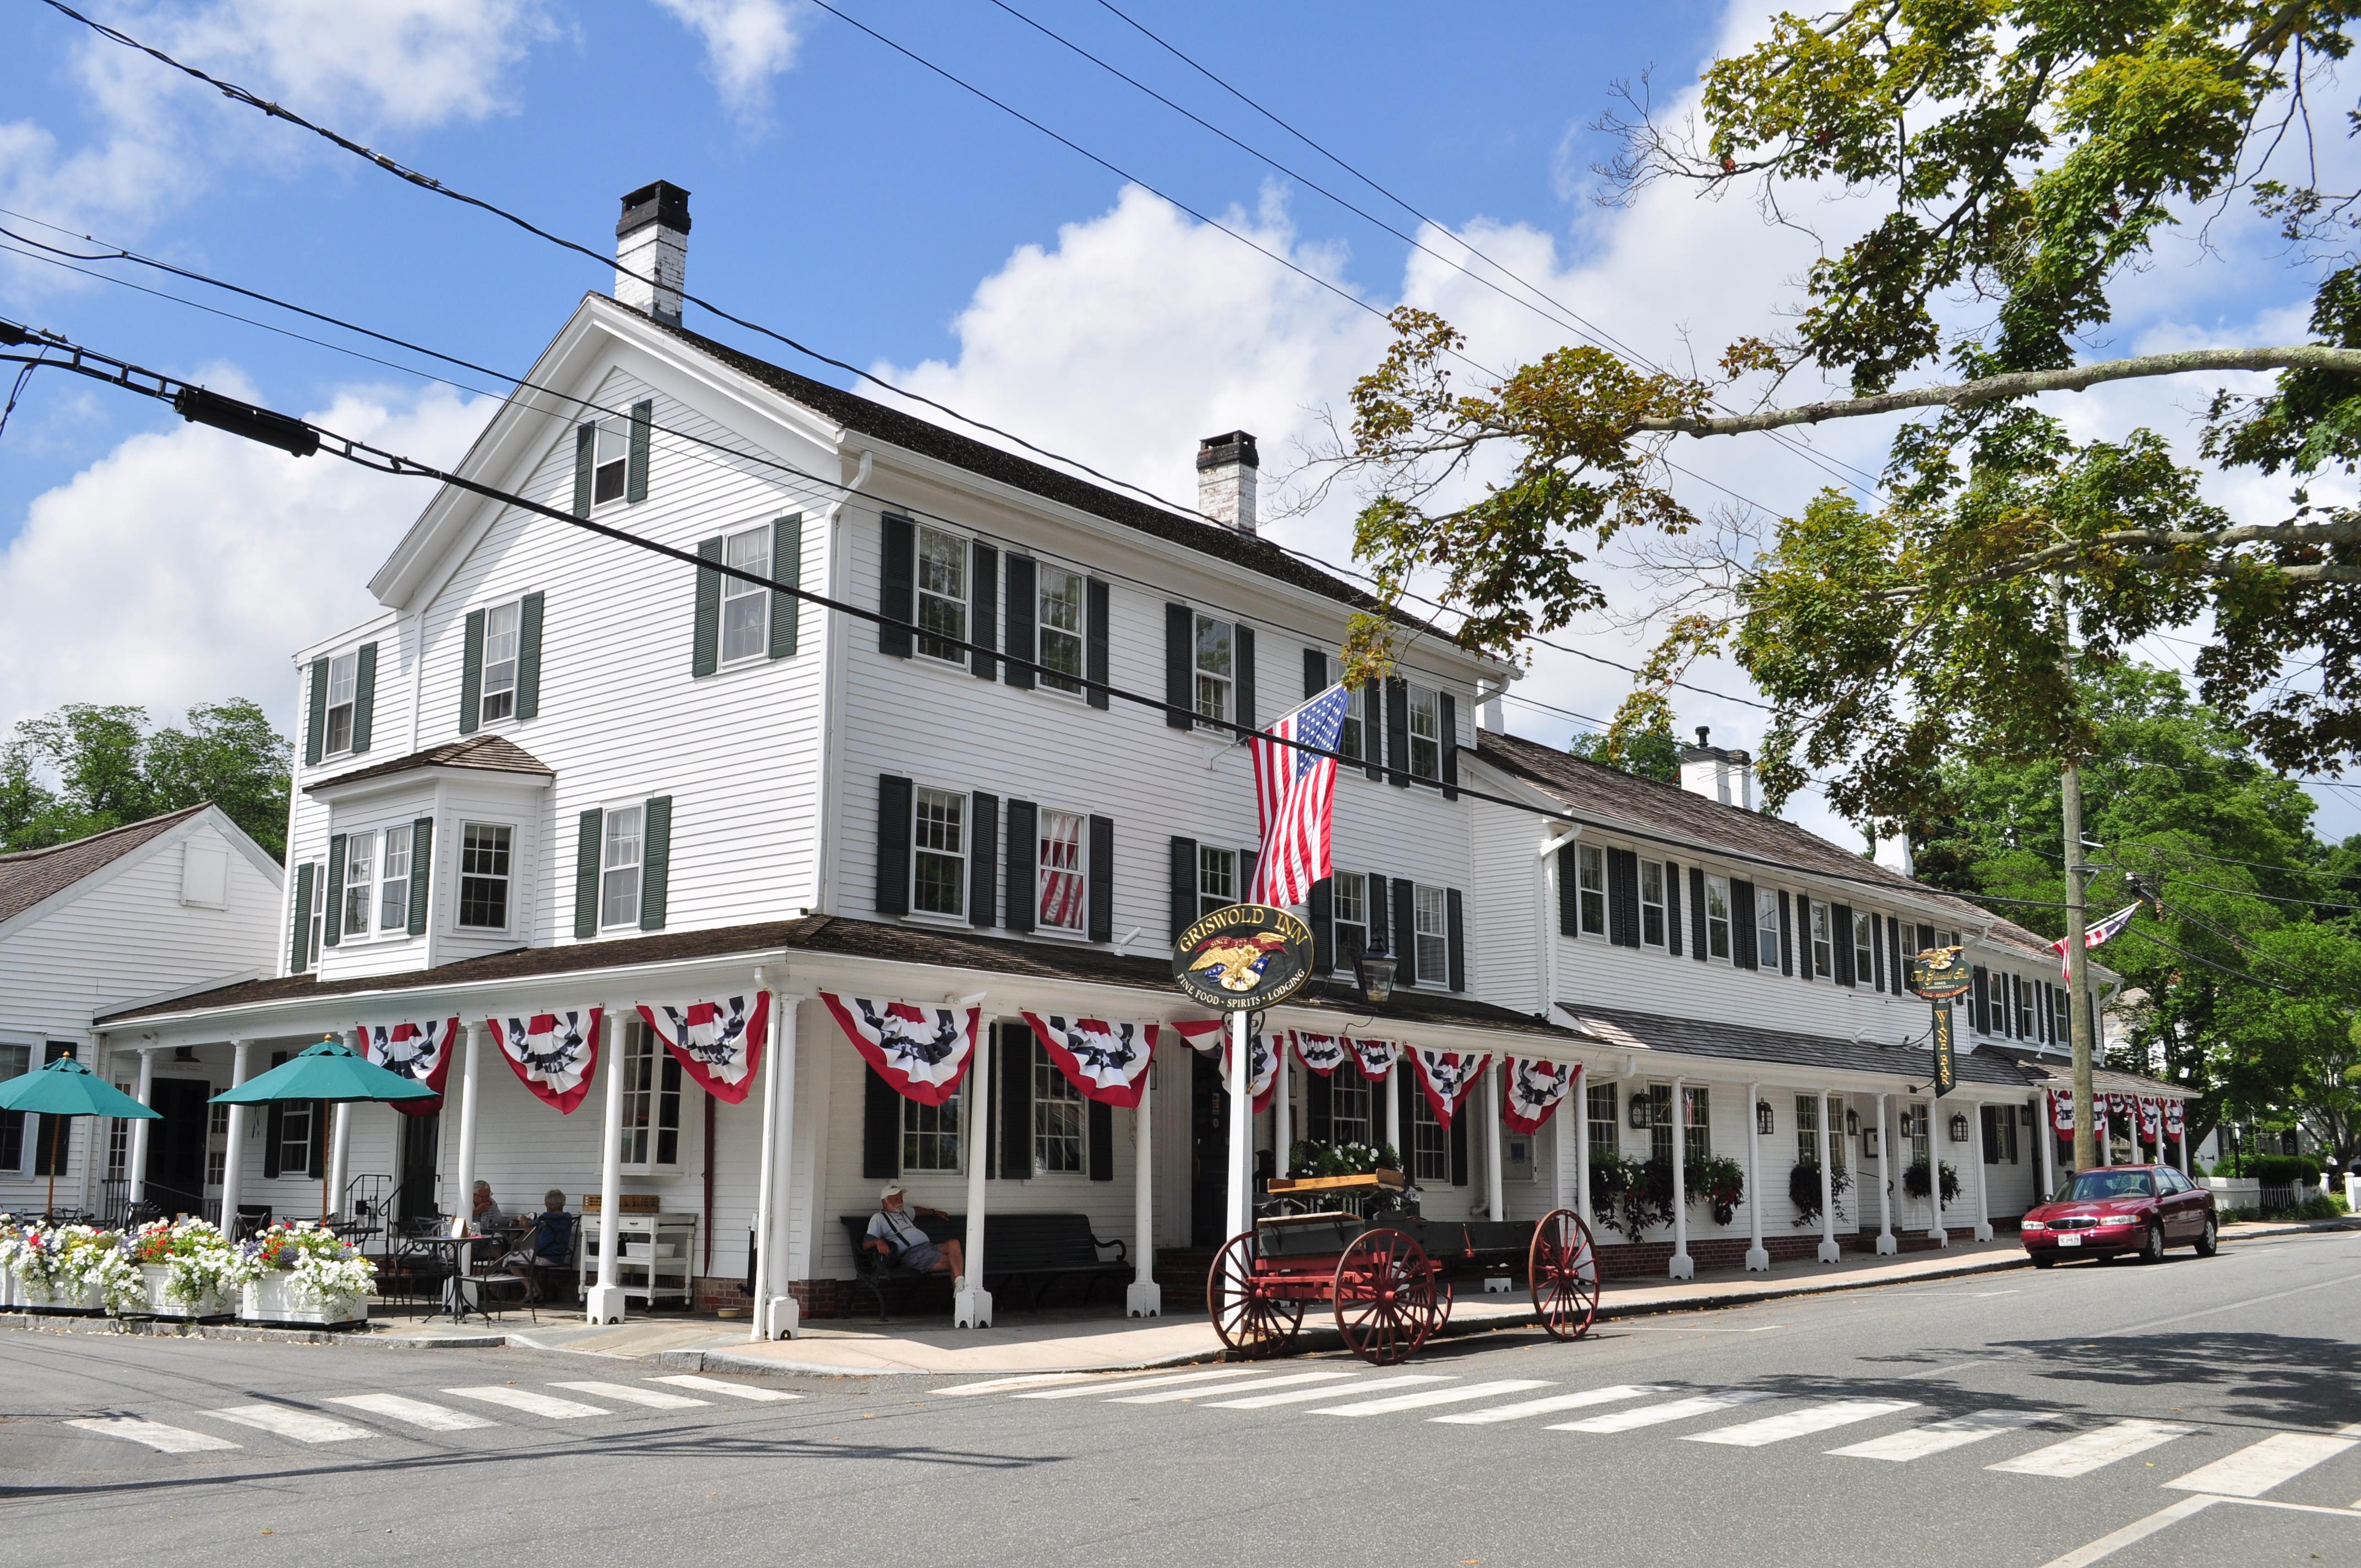 Essex CT Griswold Inn 04 (9365849358).jpg